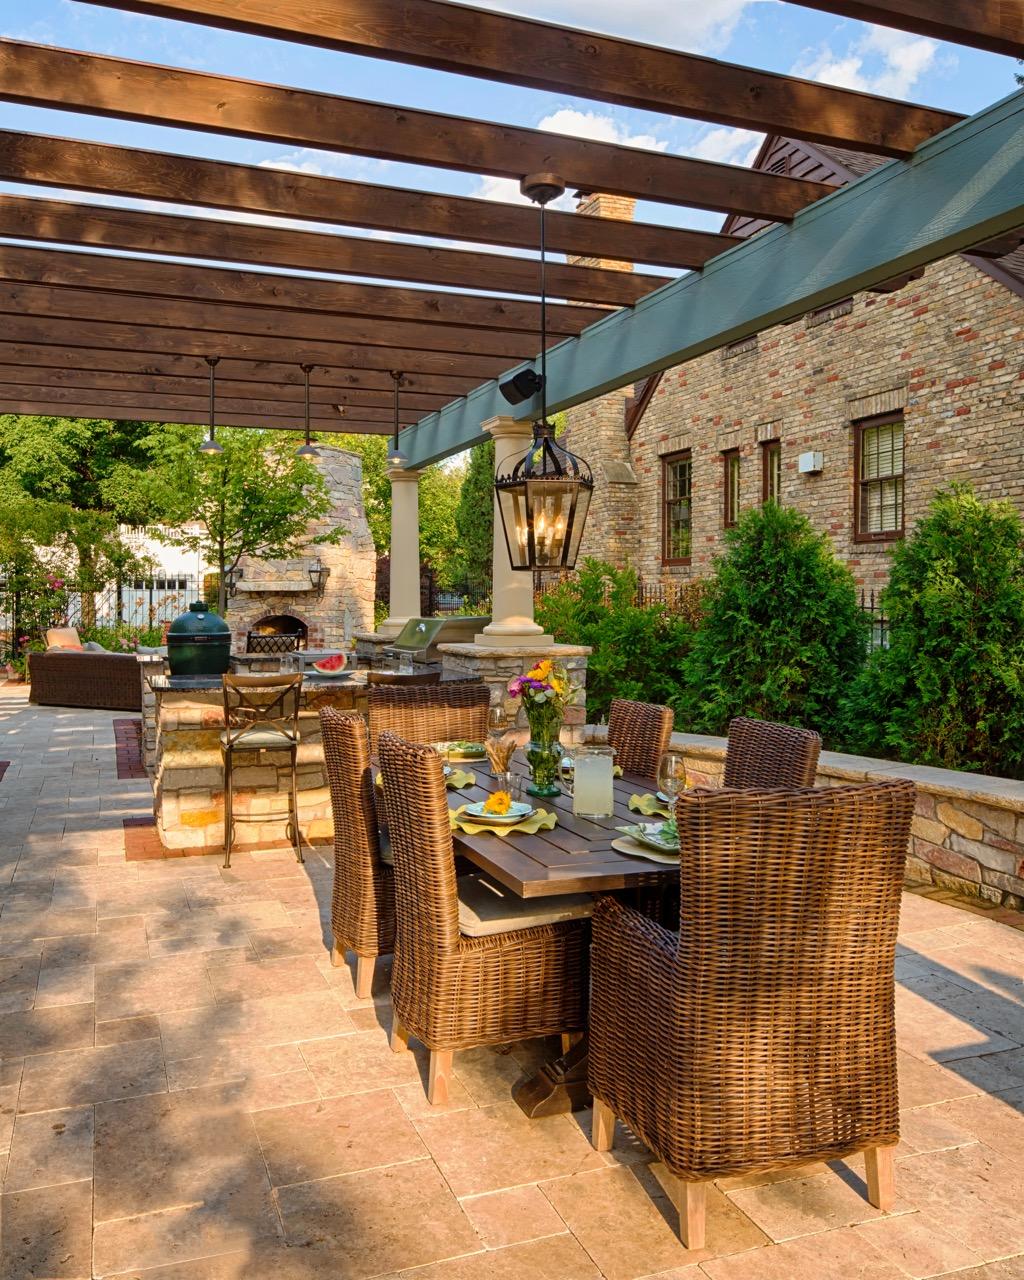 Moms Design Build - Outdoor Courtyard Landscape Design